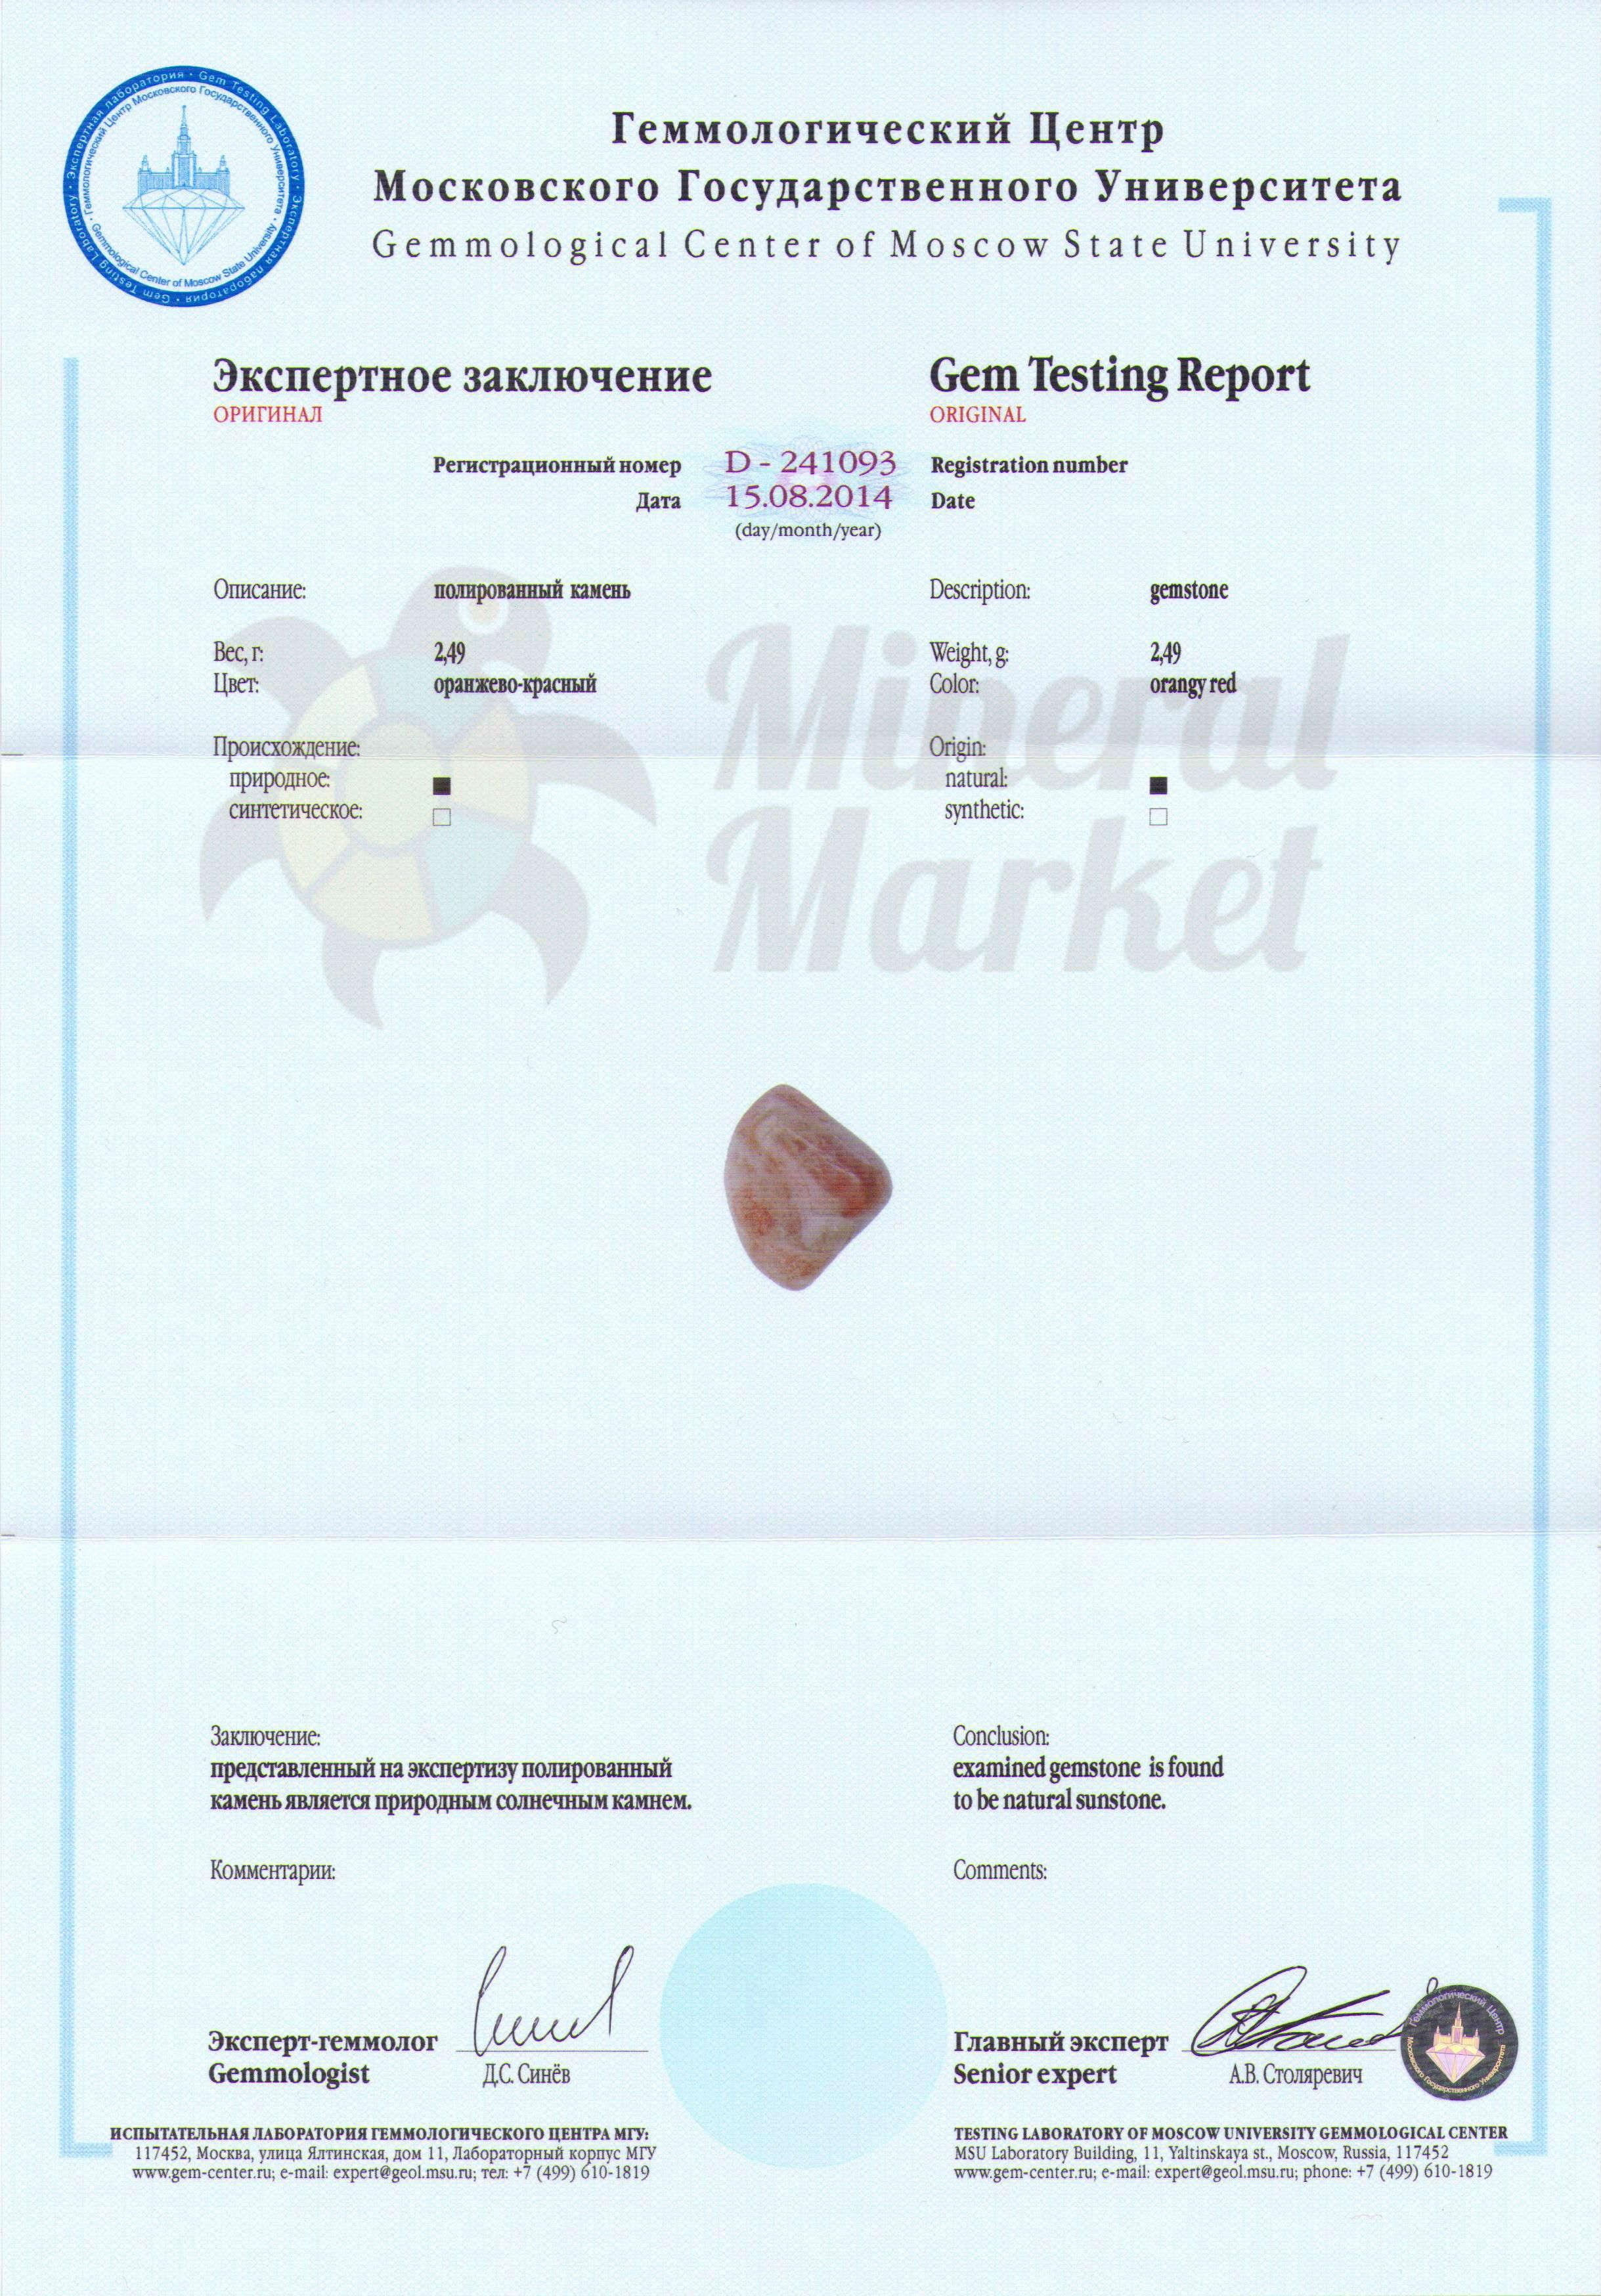 http://mineralmarket.ru/img/certificate/111.jpg